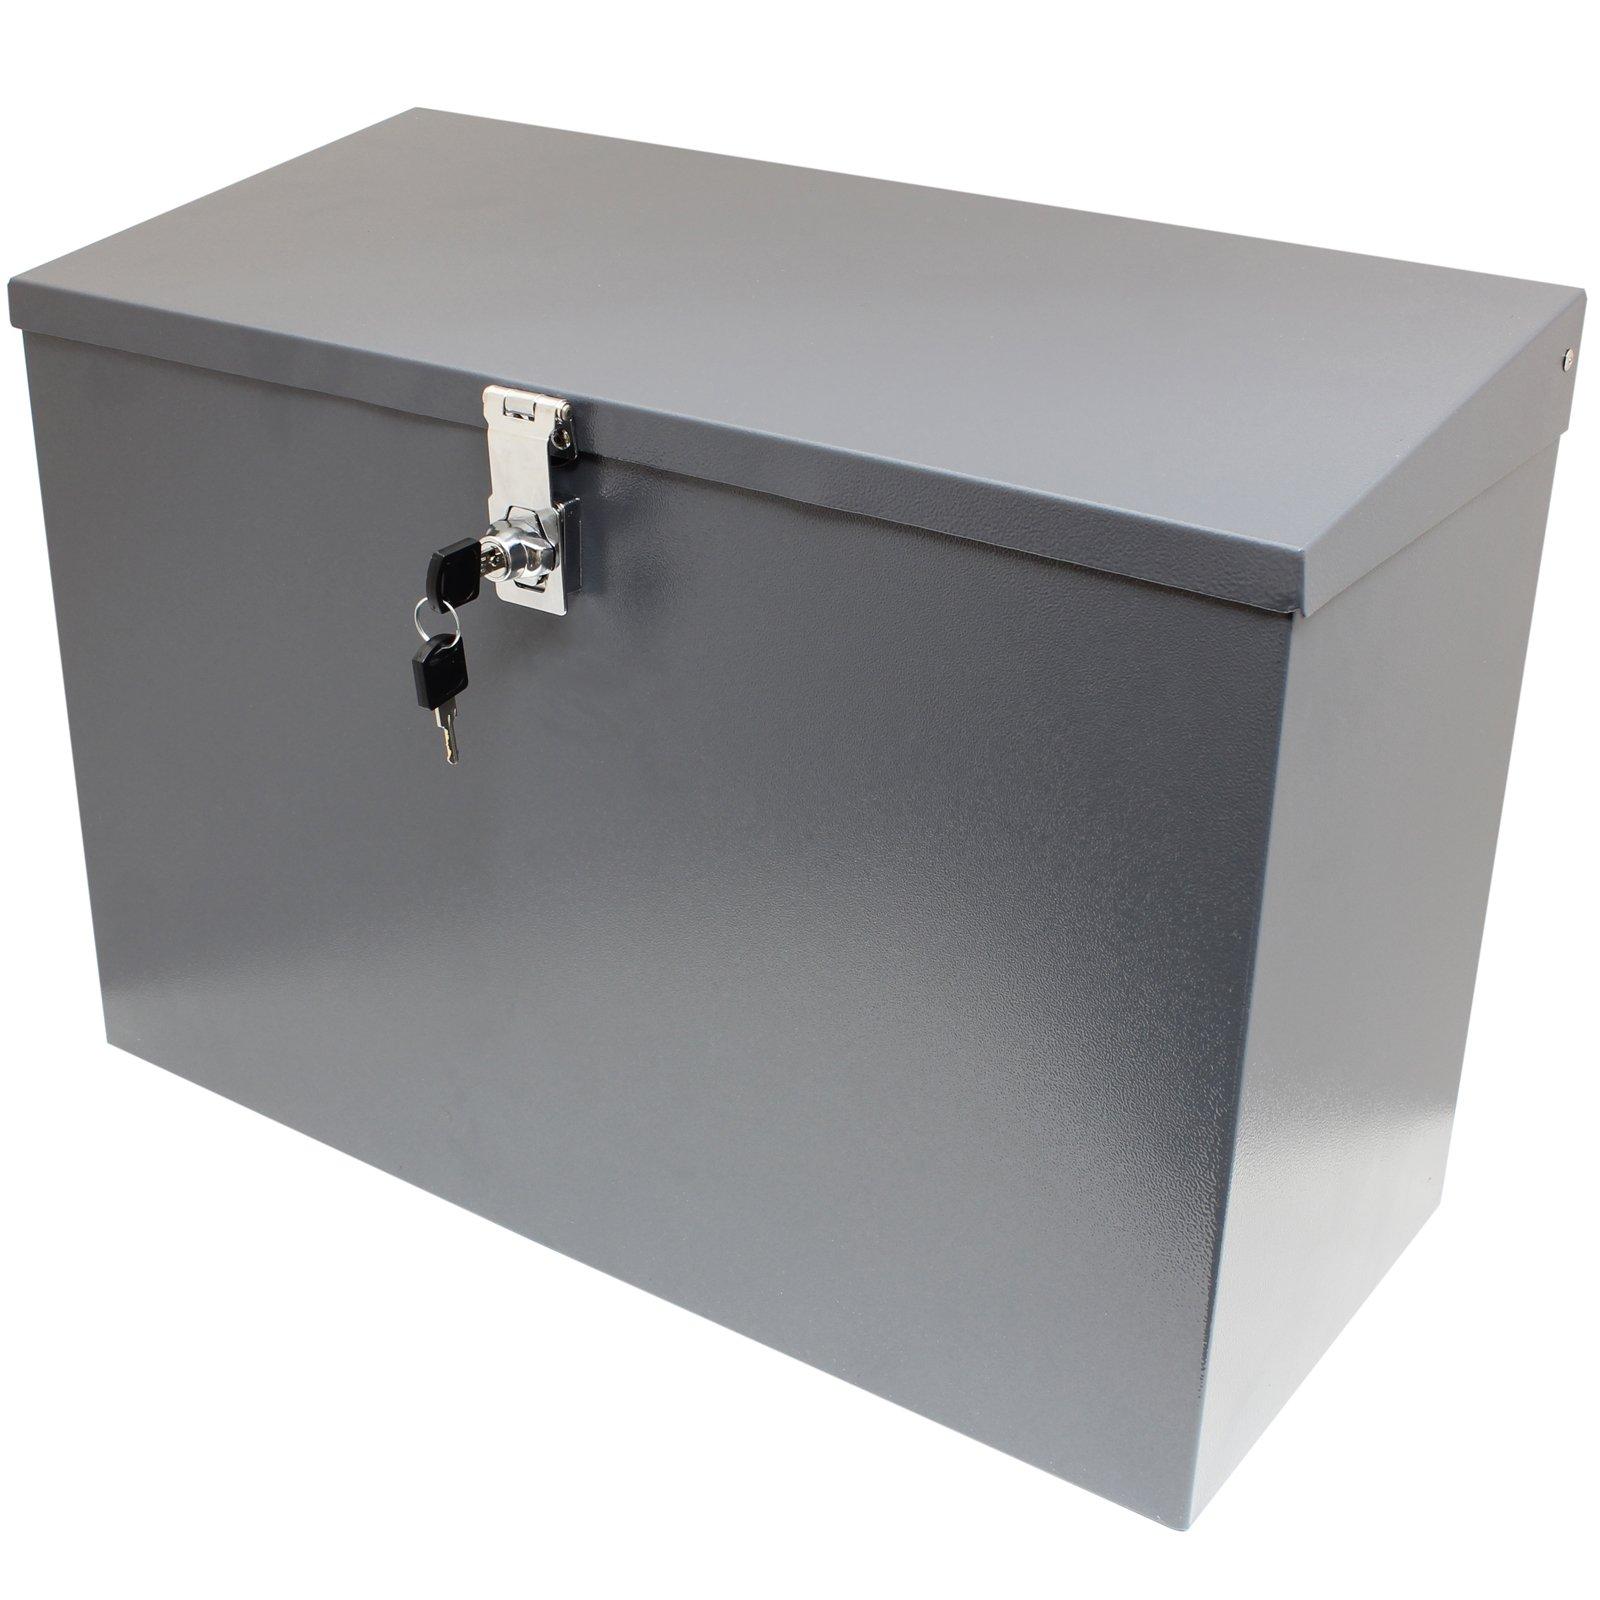 Hardcastle – Abschließbare Paketbox aus Metall – Groß – Grau